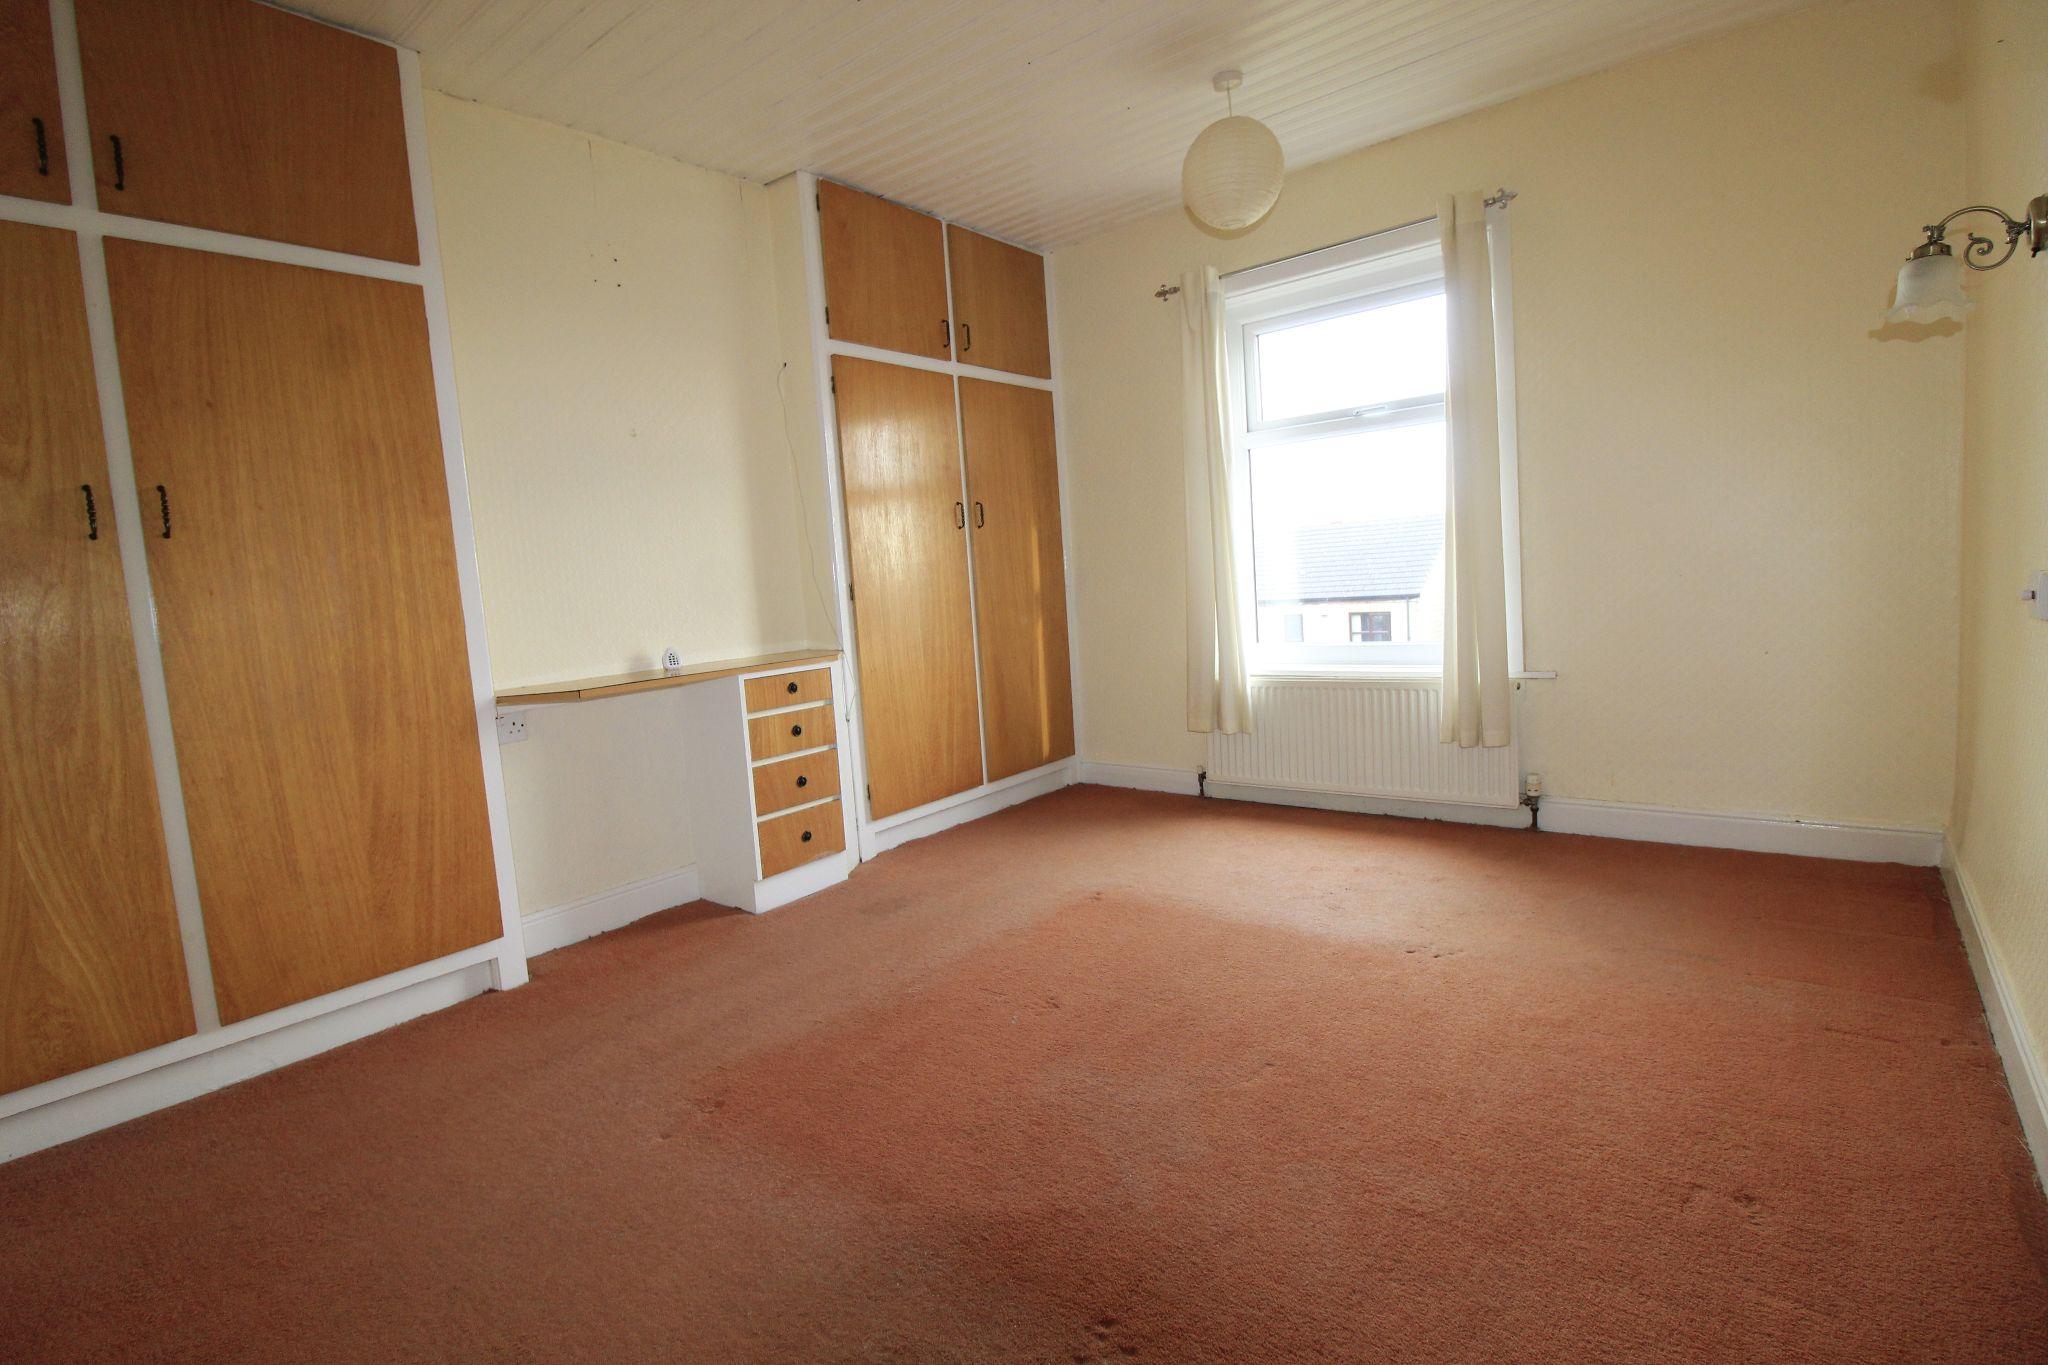 3 bedroom end terraced house To Let in Bradford - Bedroom 1